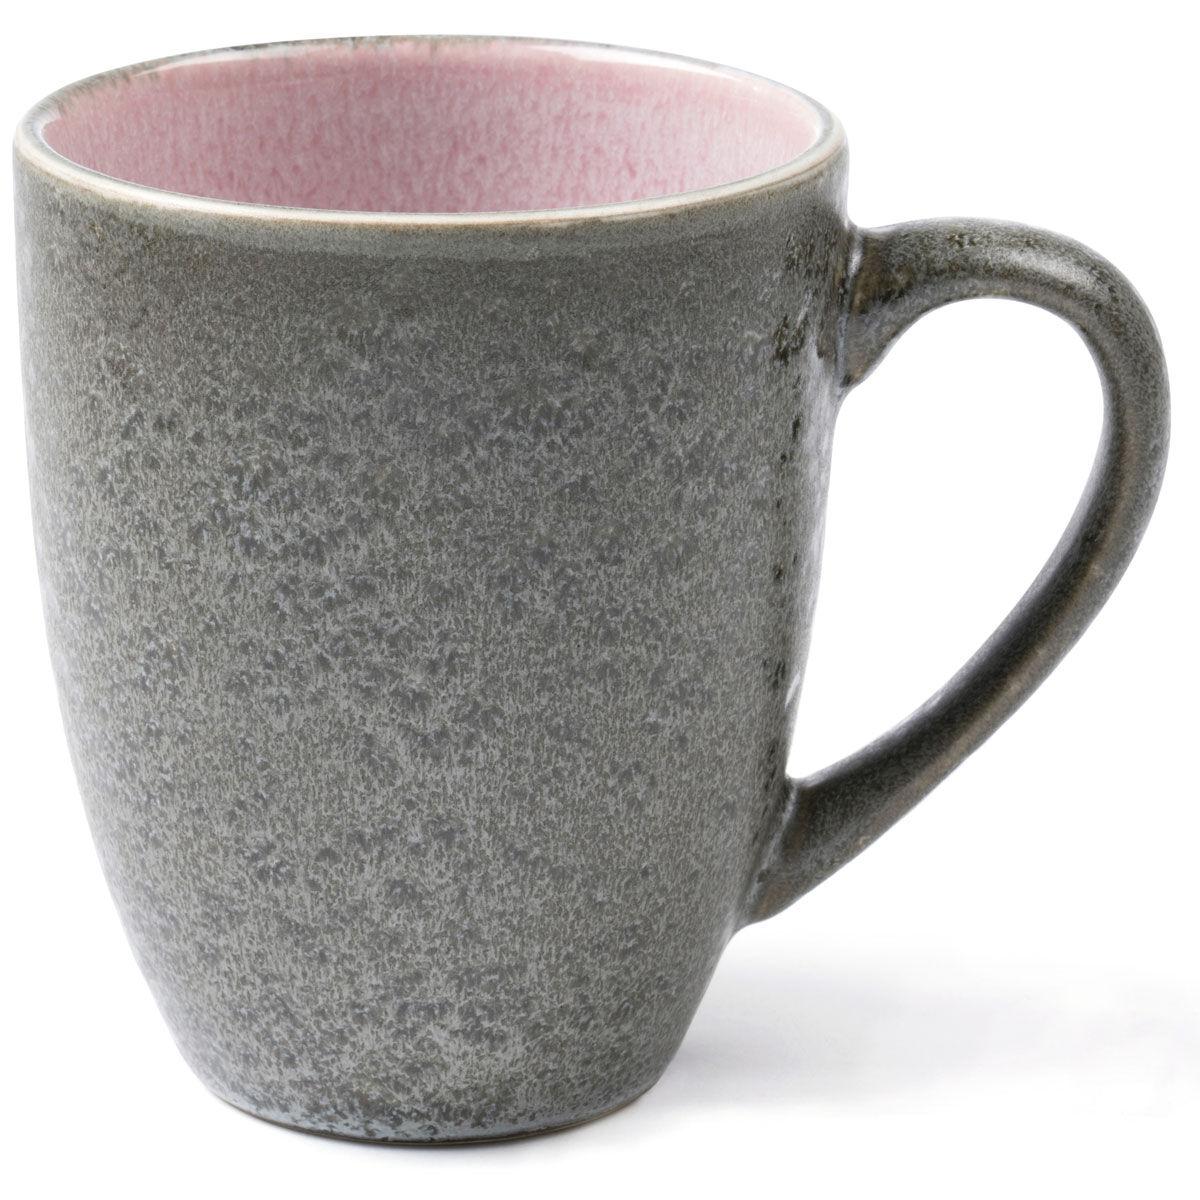 Bitz Bitz Mug 30 cl, Grey/Pink